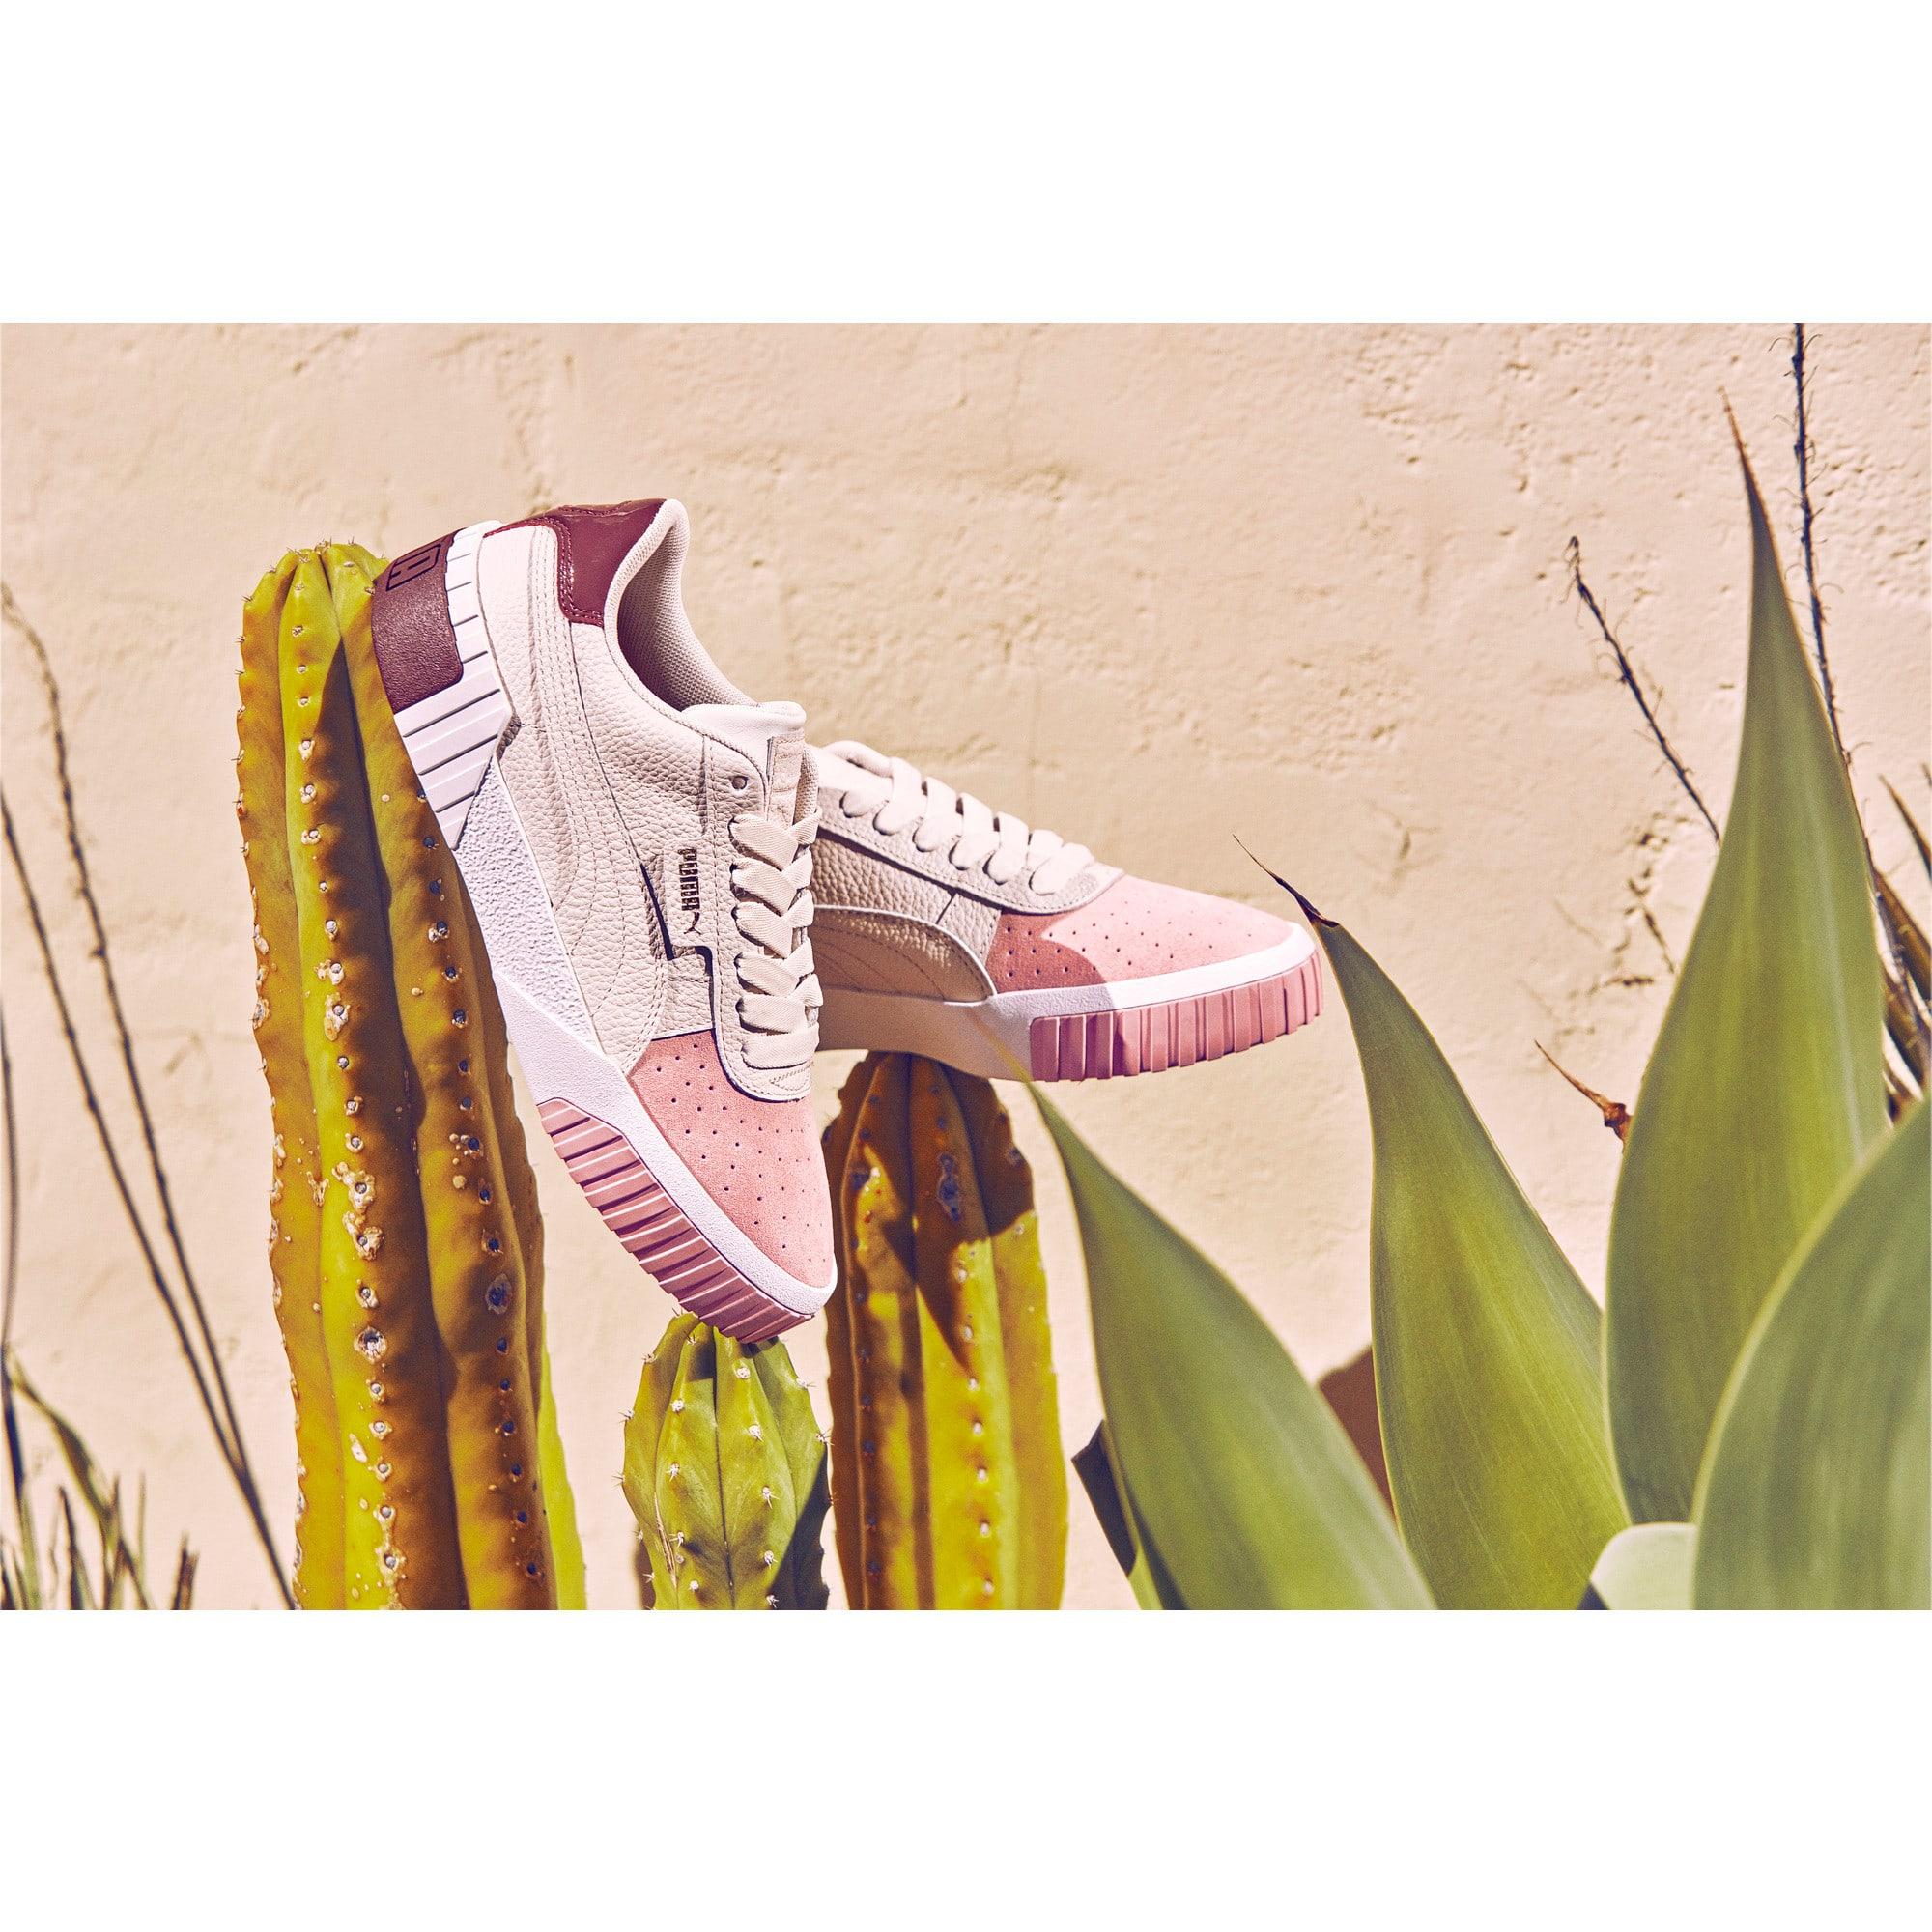 Thumbnail 10 of Cali Remix Women's Trainers, Pastel Parchment-Bridal Rose, medium-IND